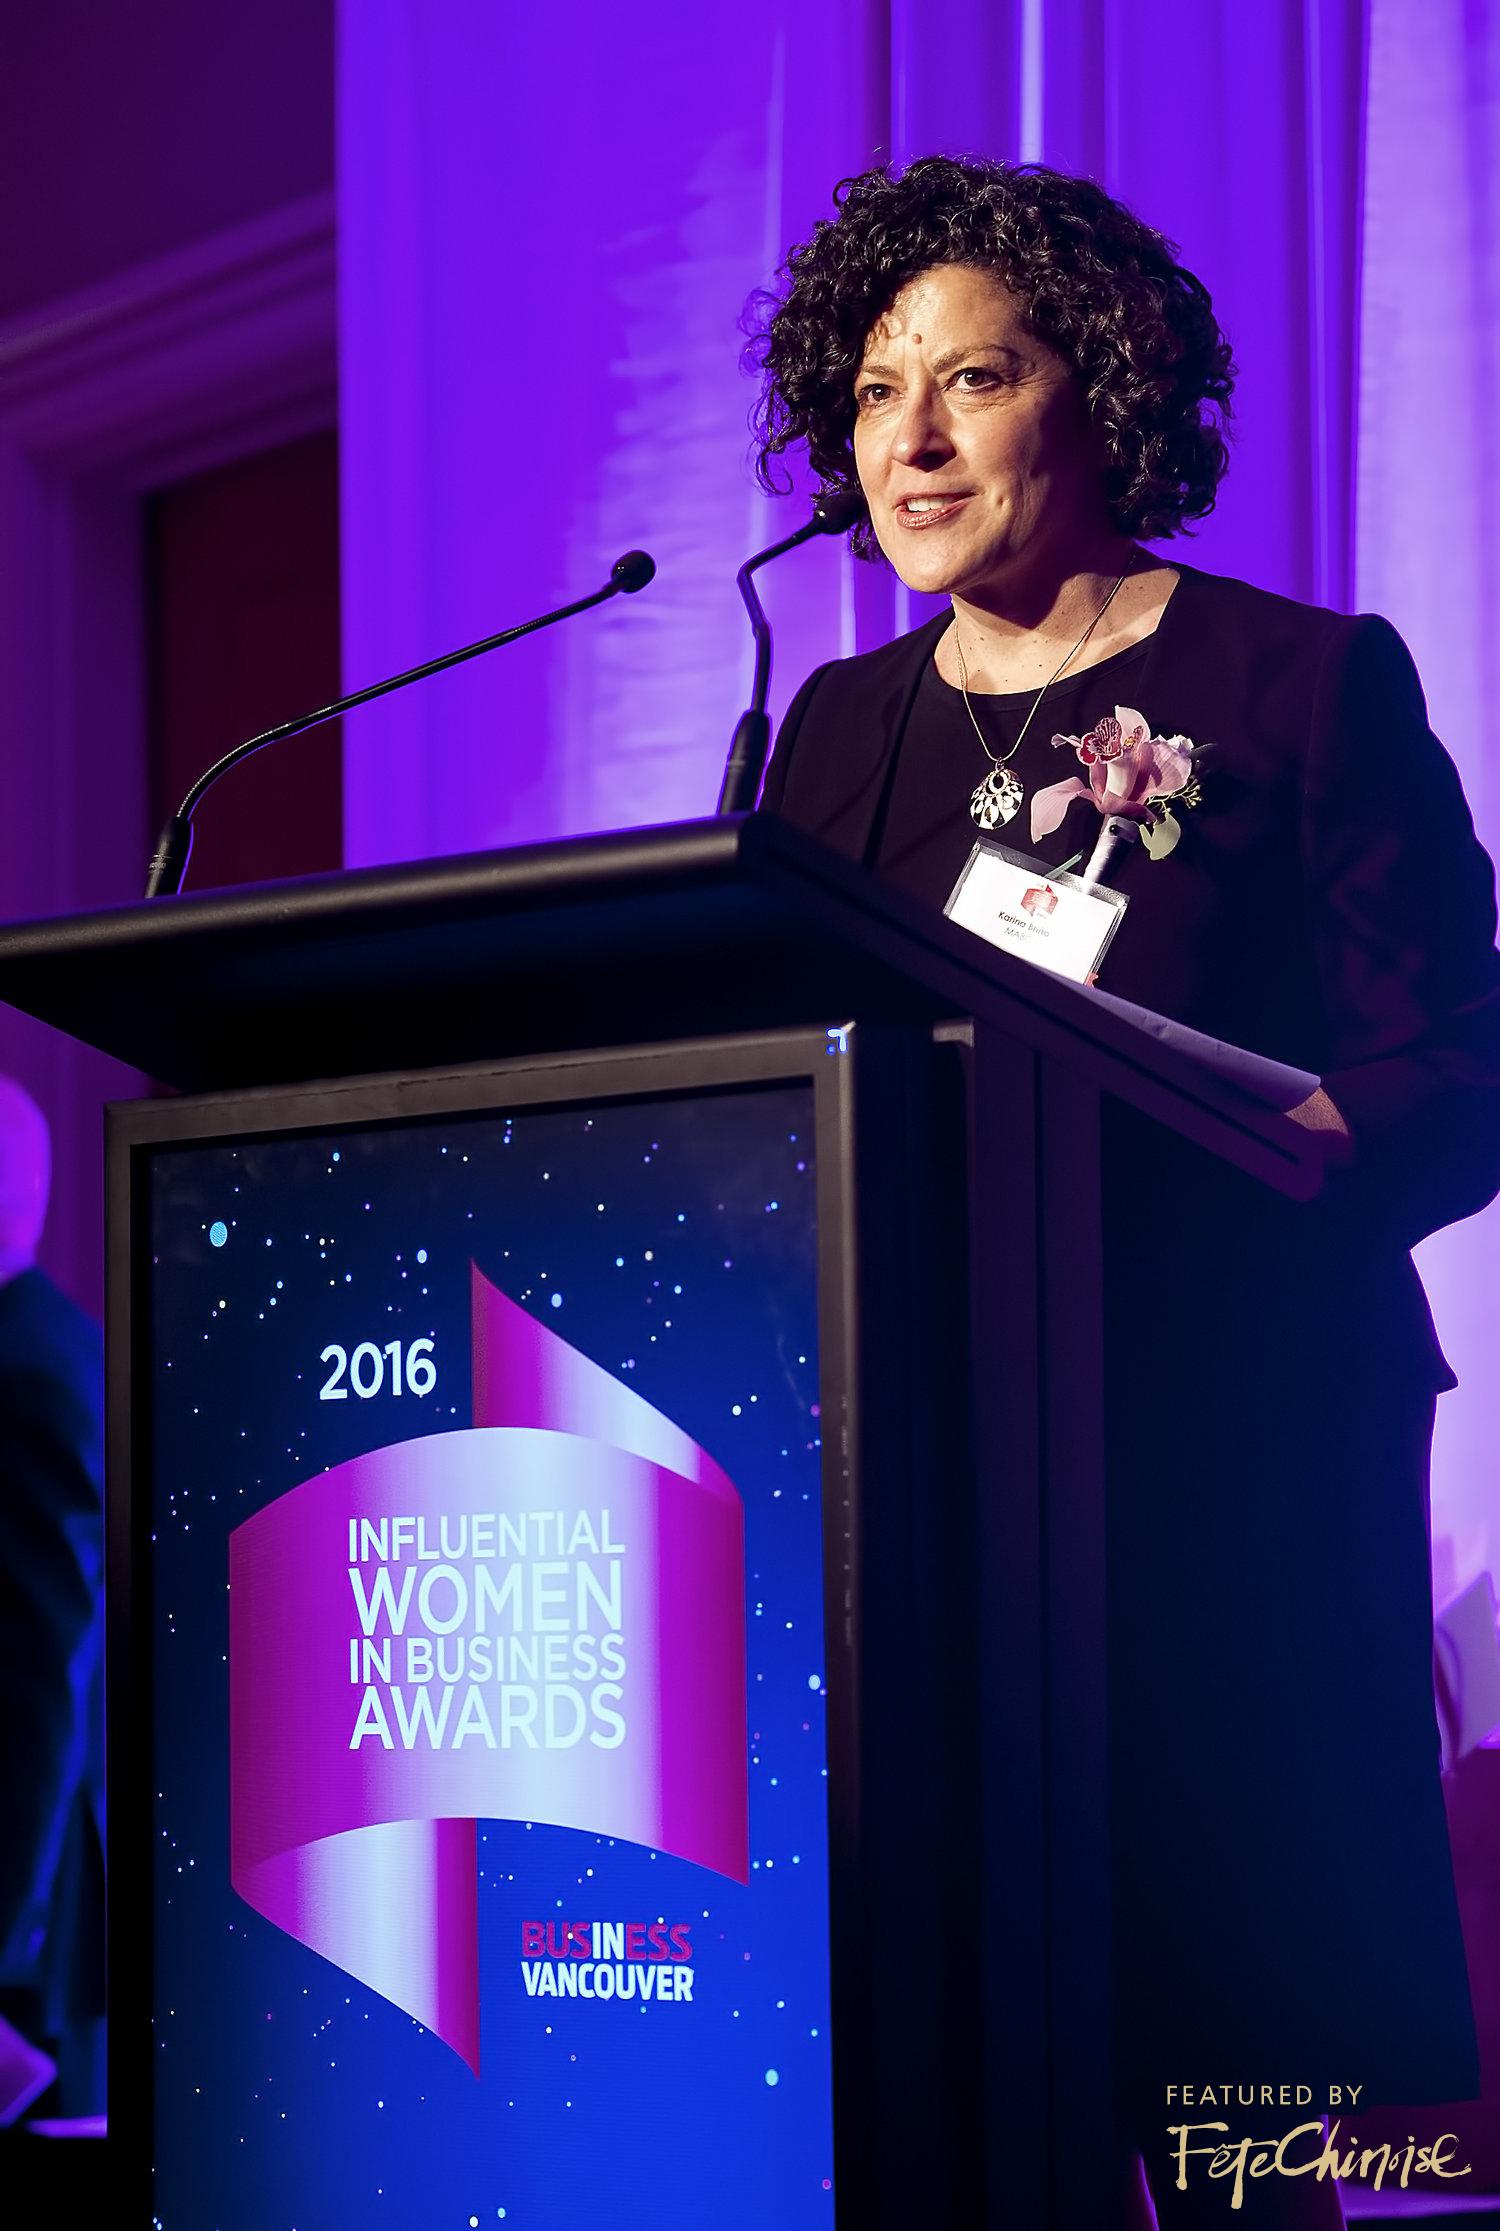 Karina Briño gives her acceptance speech